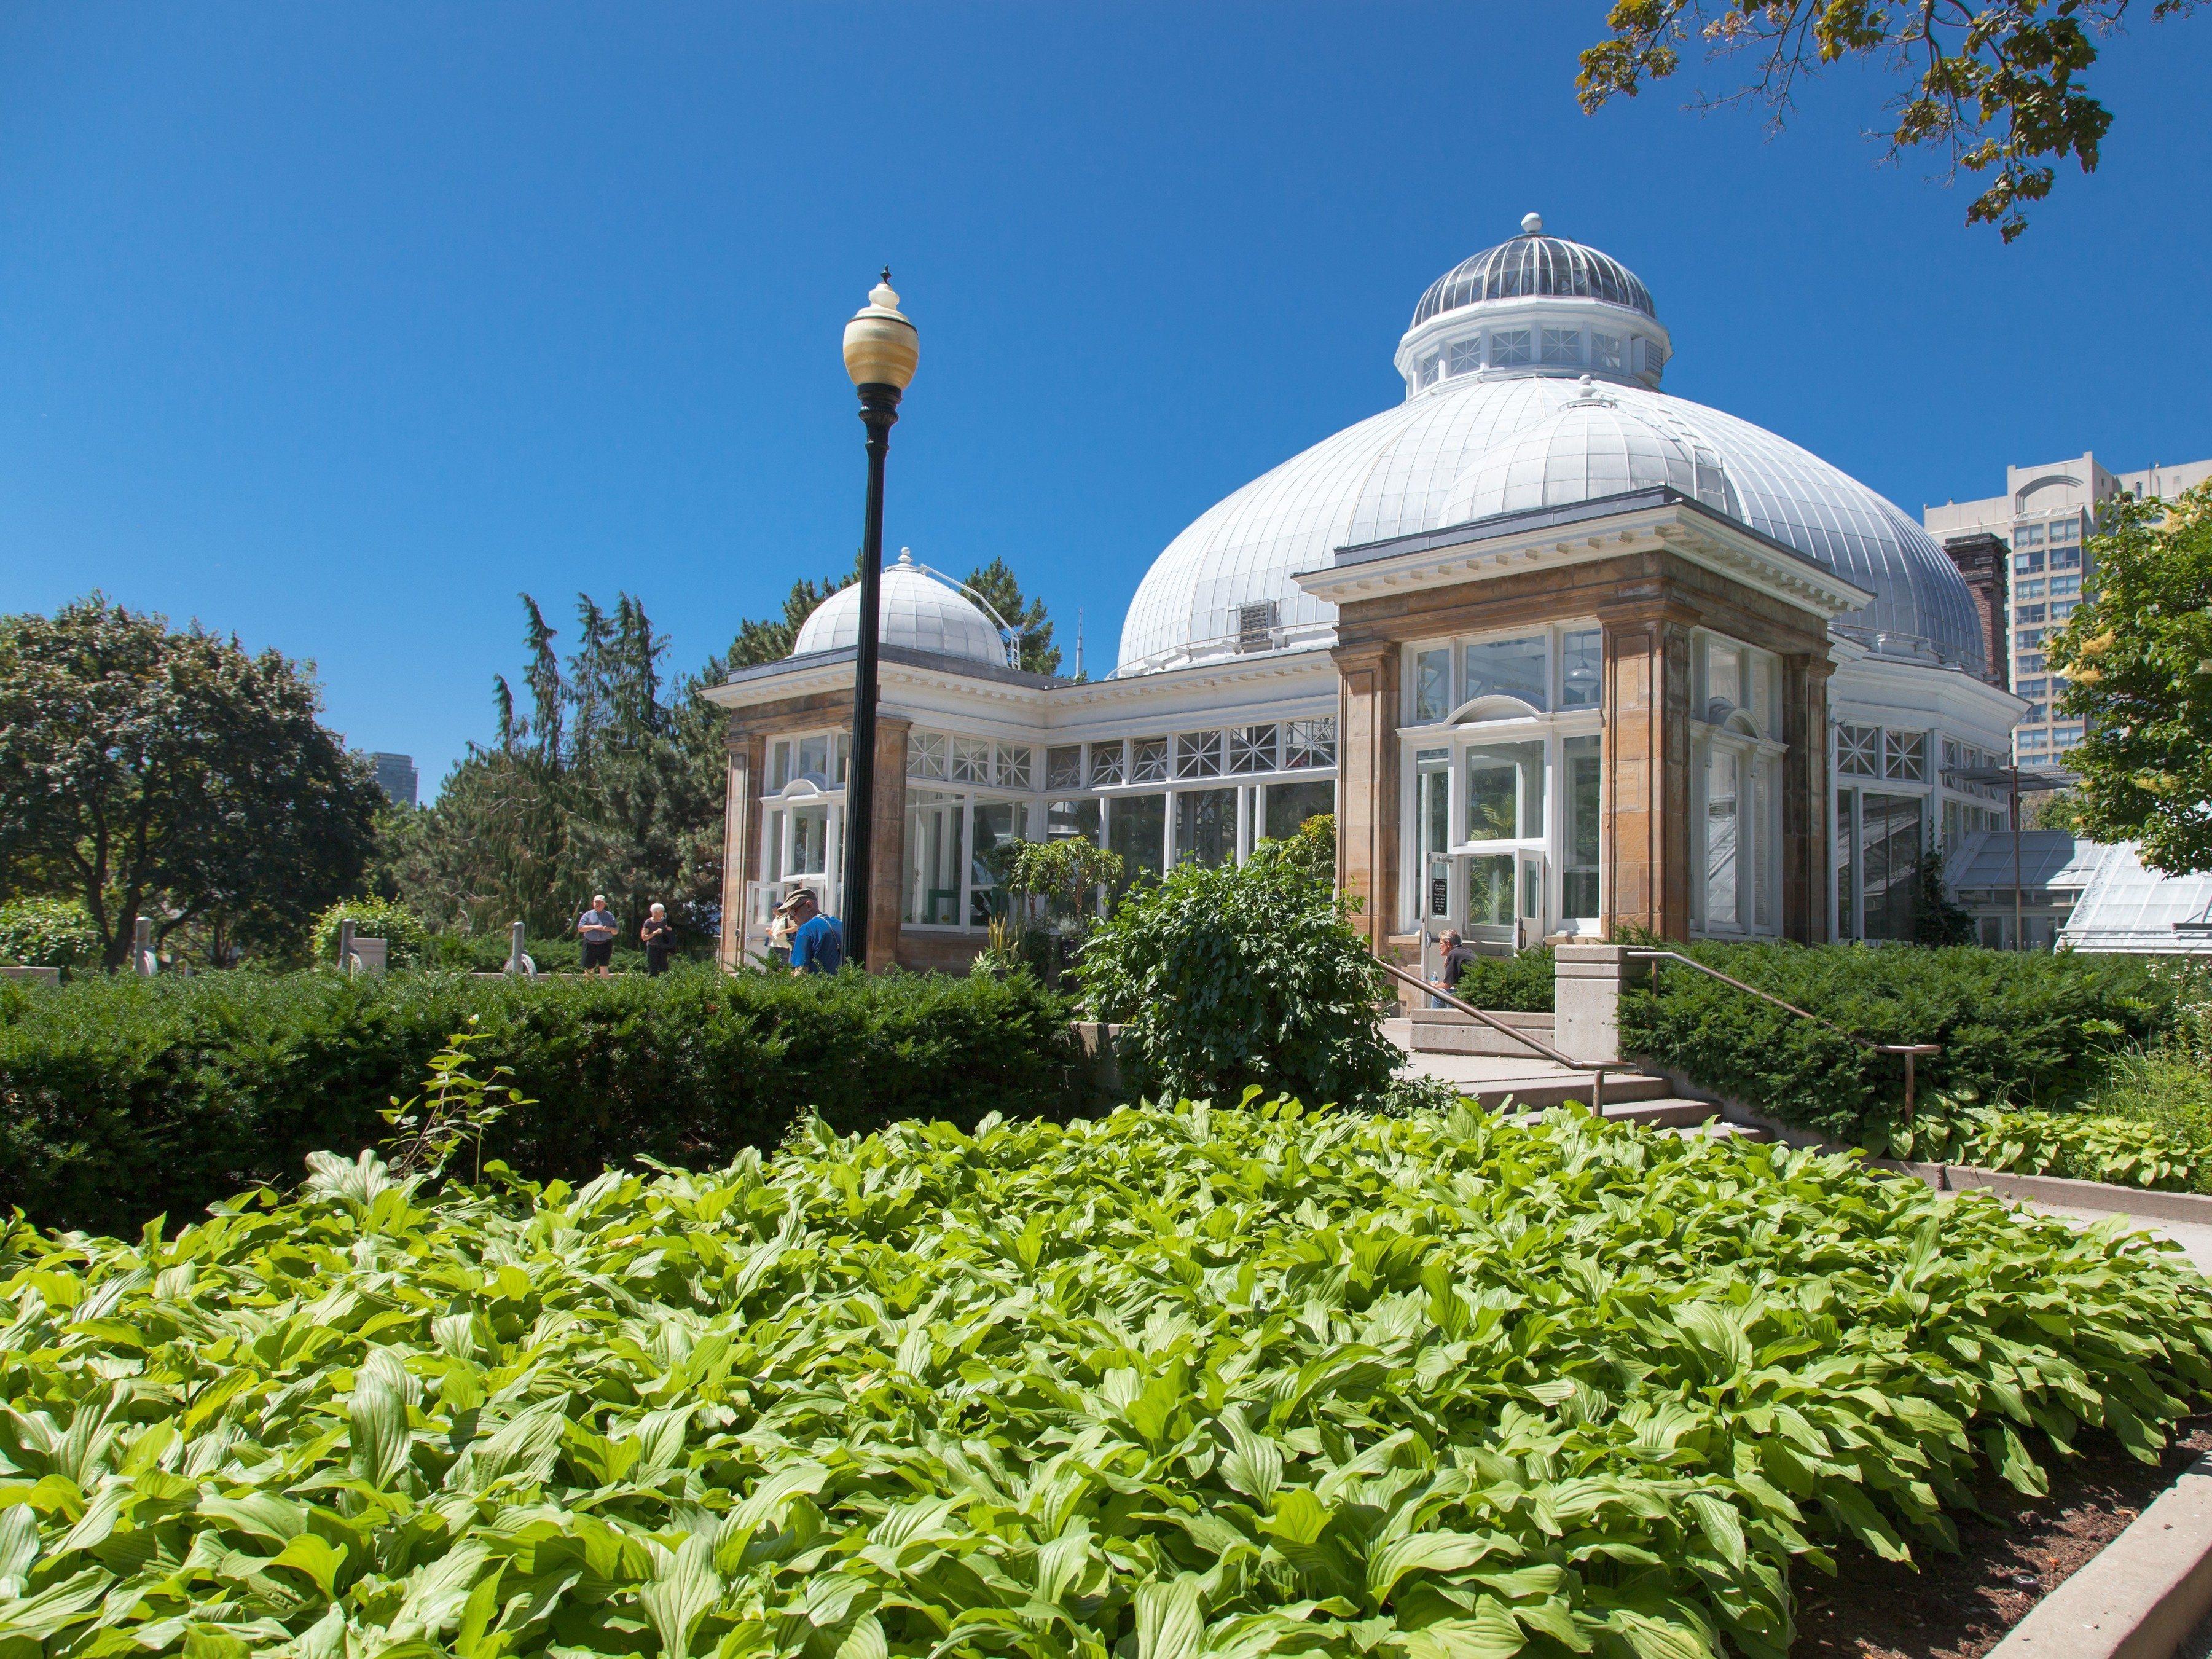 7. Allan Gardens Conservatory